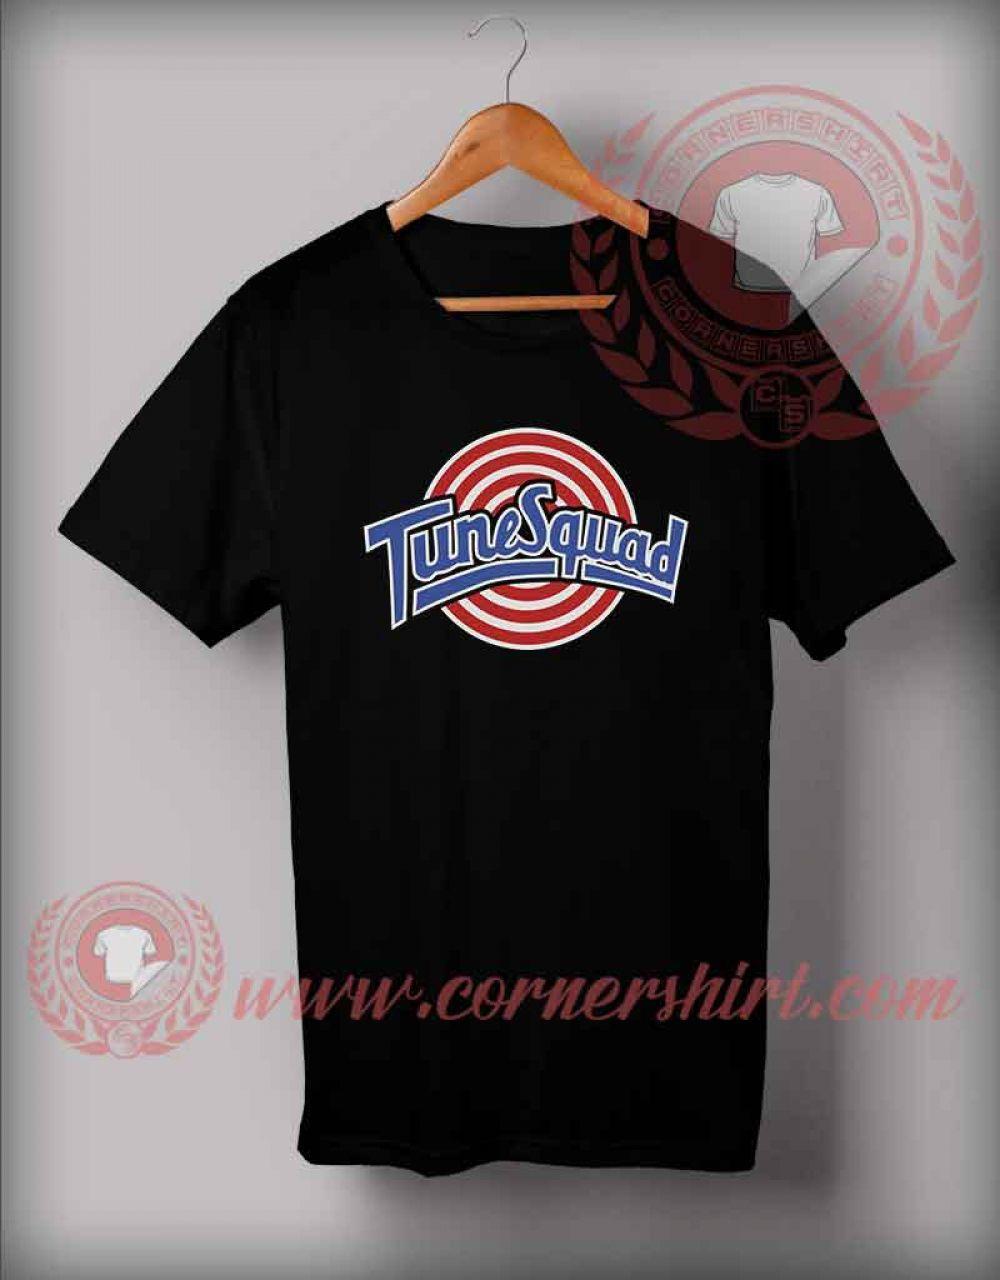 6bf8c94d0 Tune Squad Custom Design T Shirts   Price   14.50    shirt